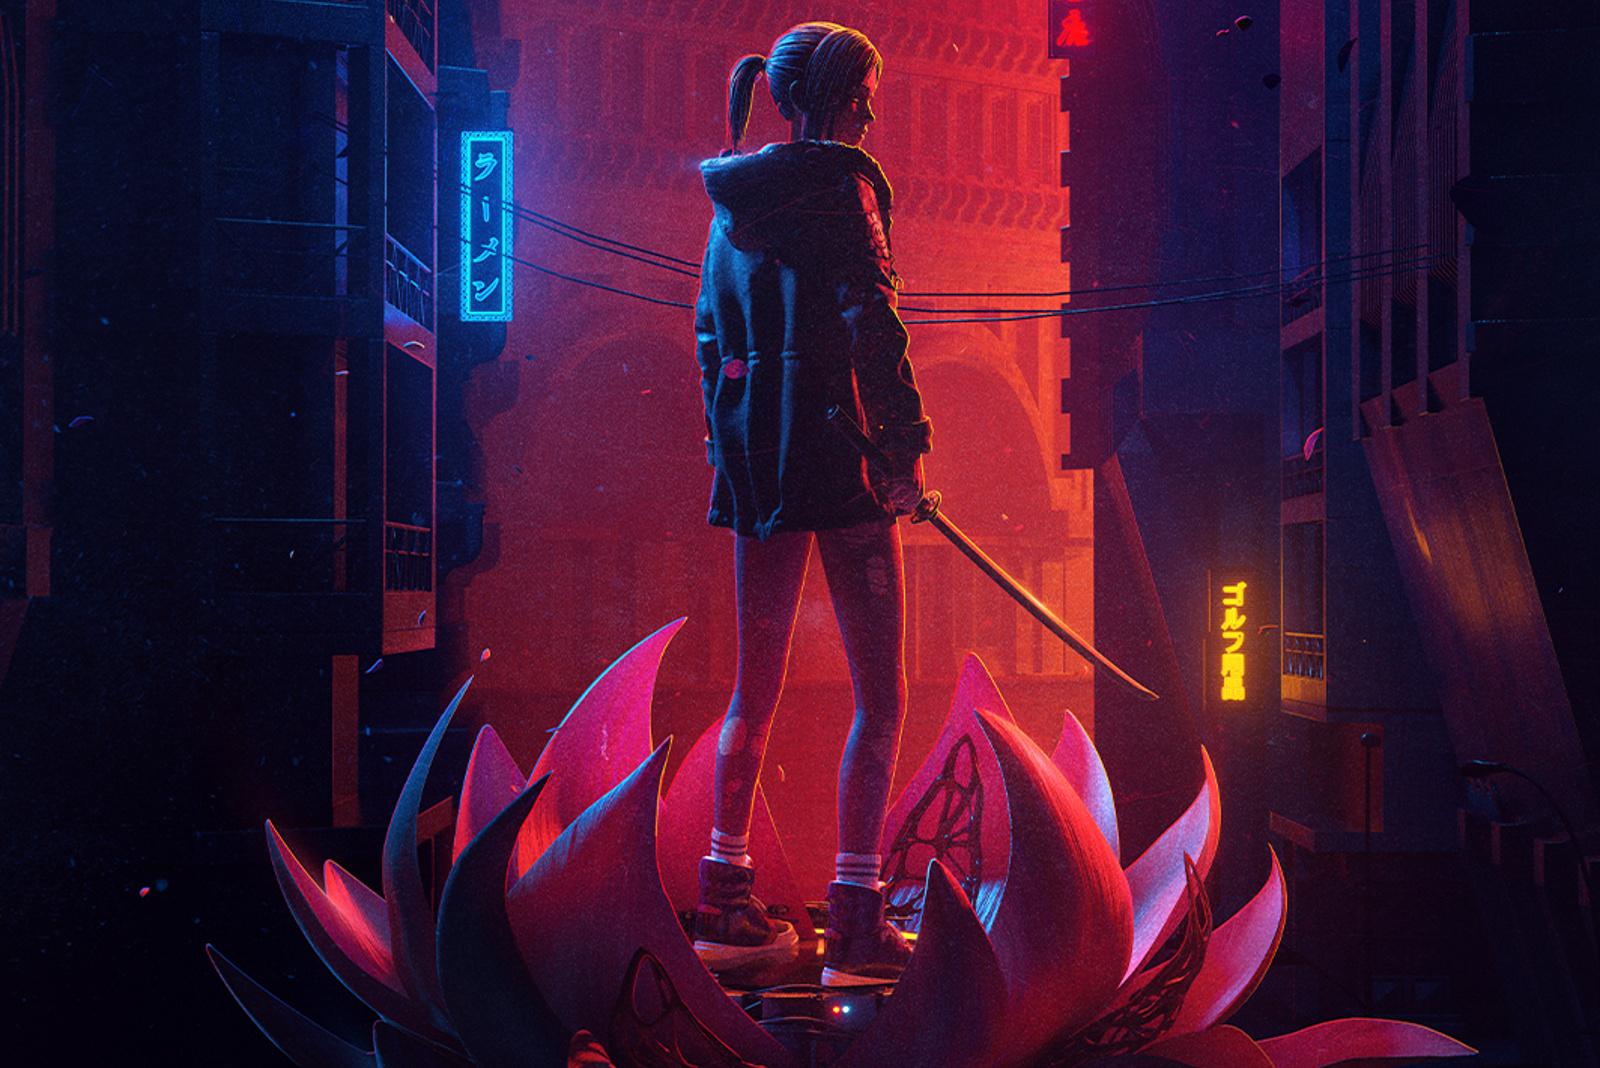 Blade Runner: Black Lotus trailer shows Replicant on the run